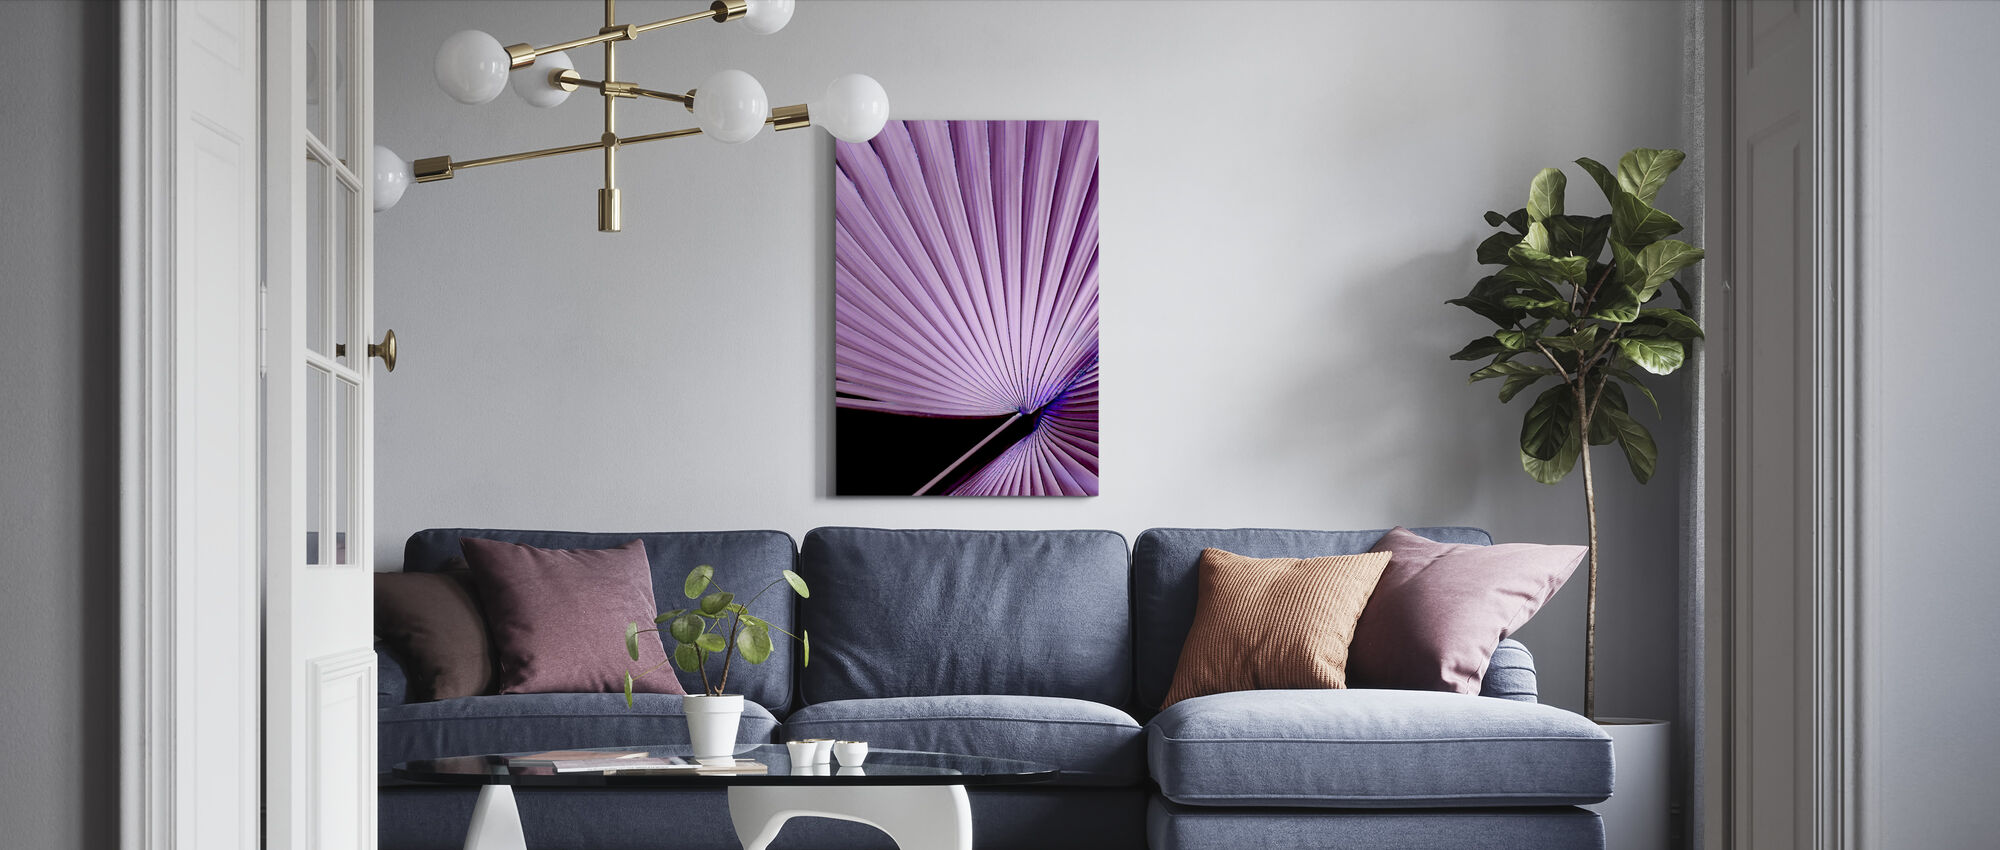 Fan Girl - Canvas print - Living Room